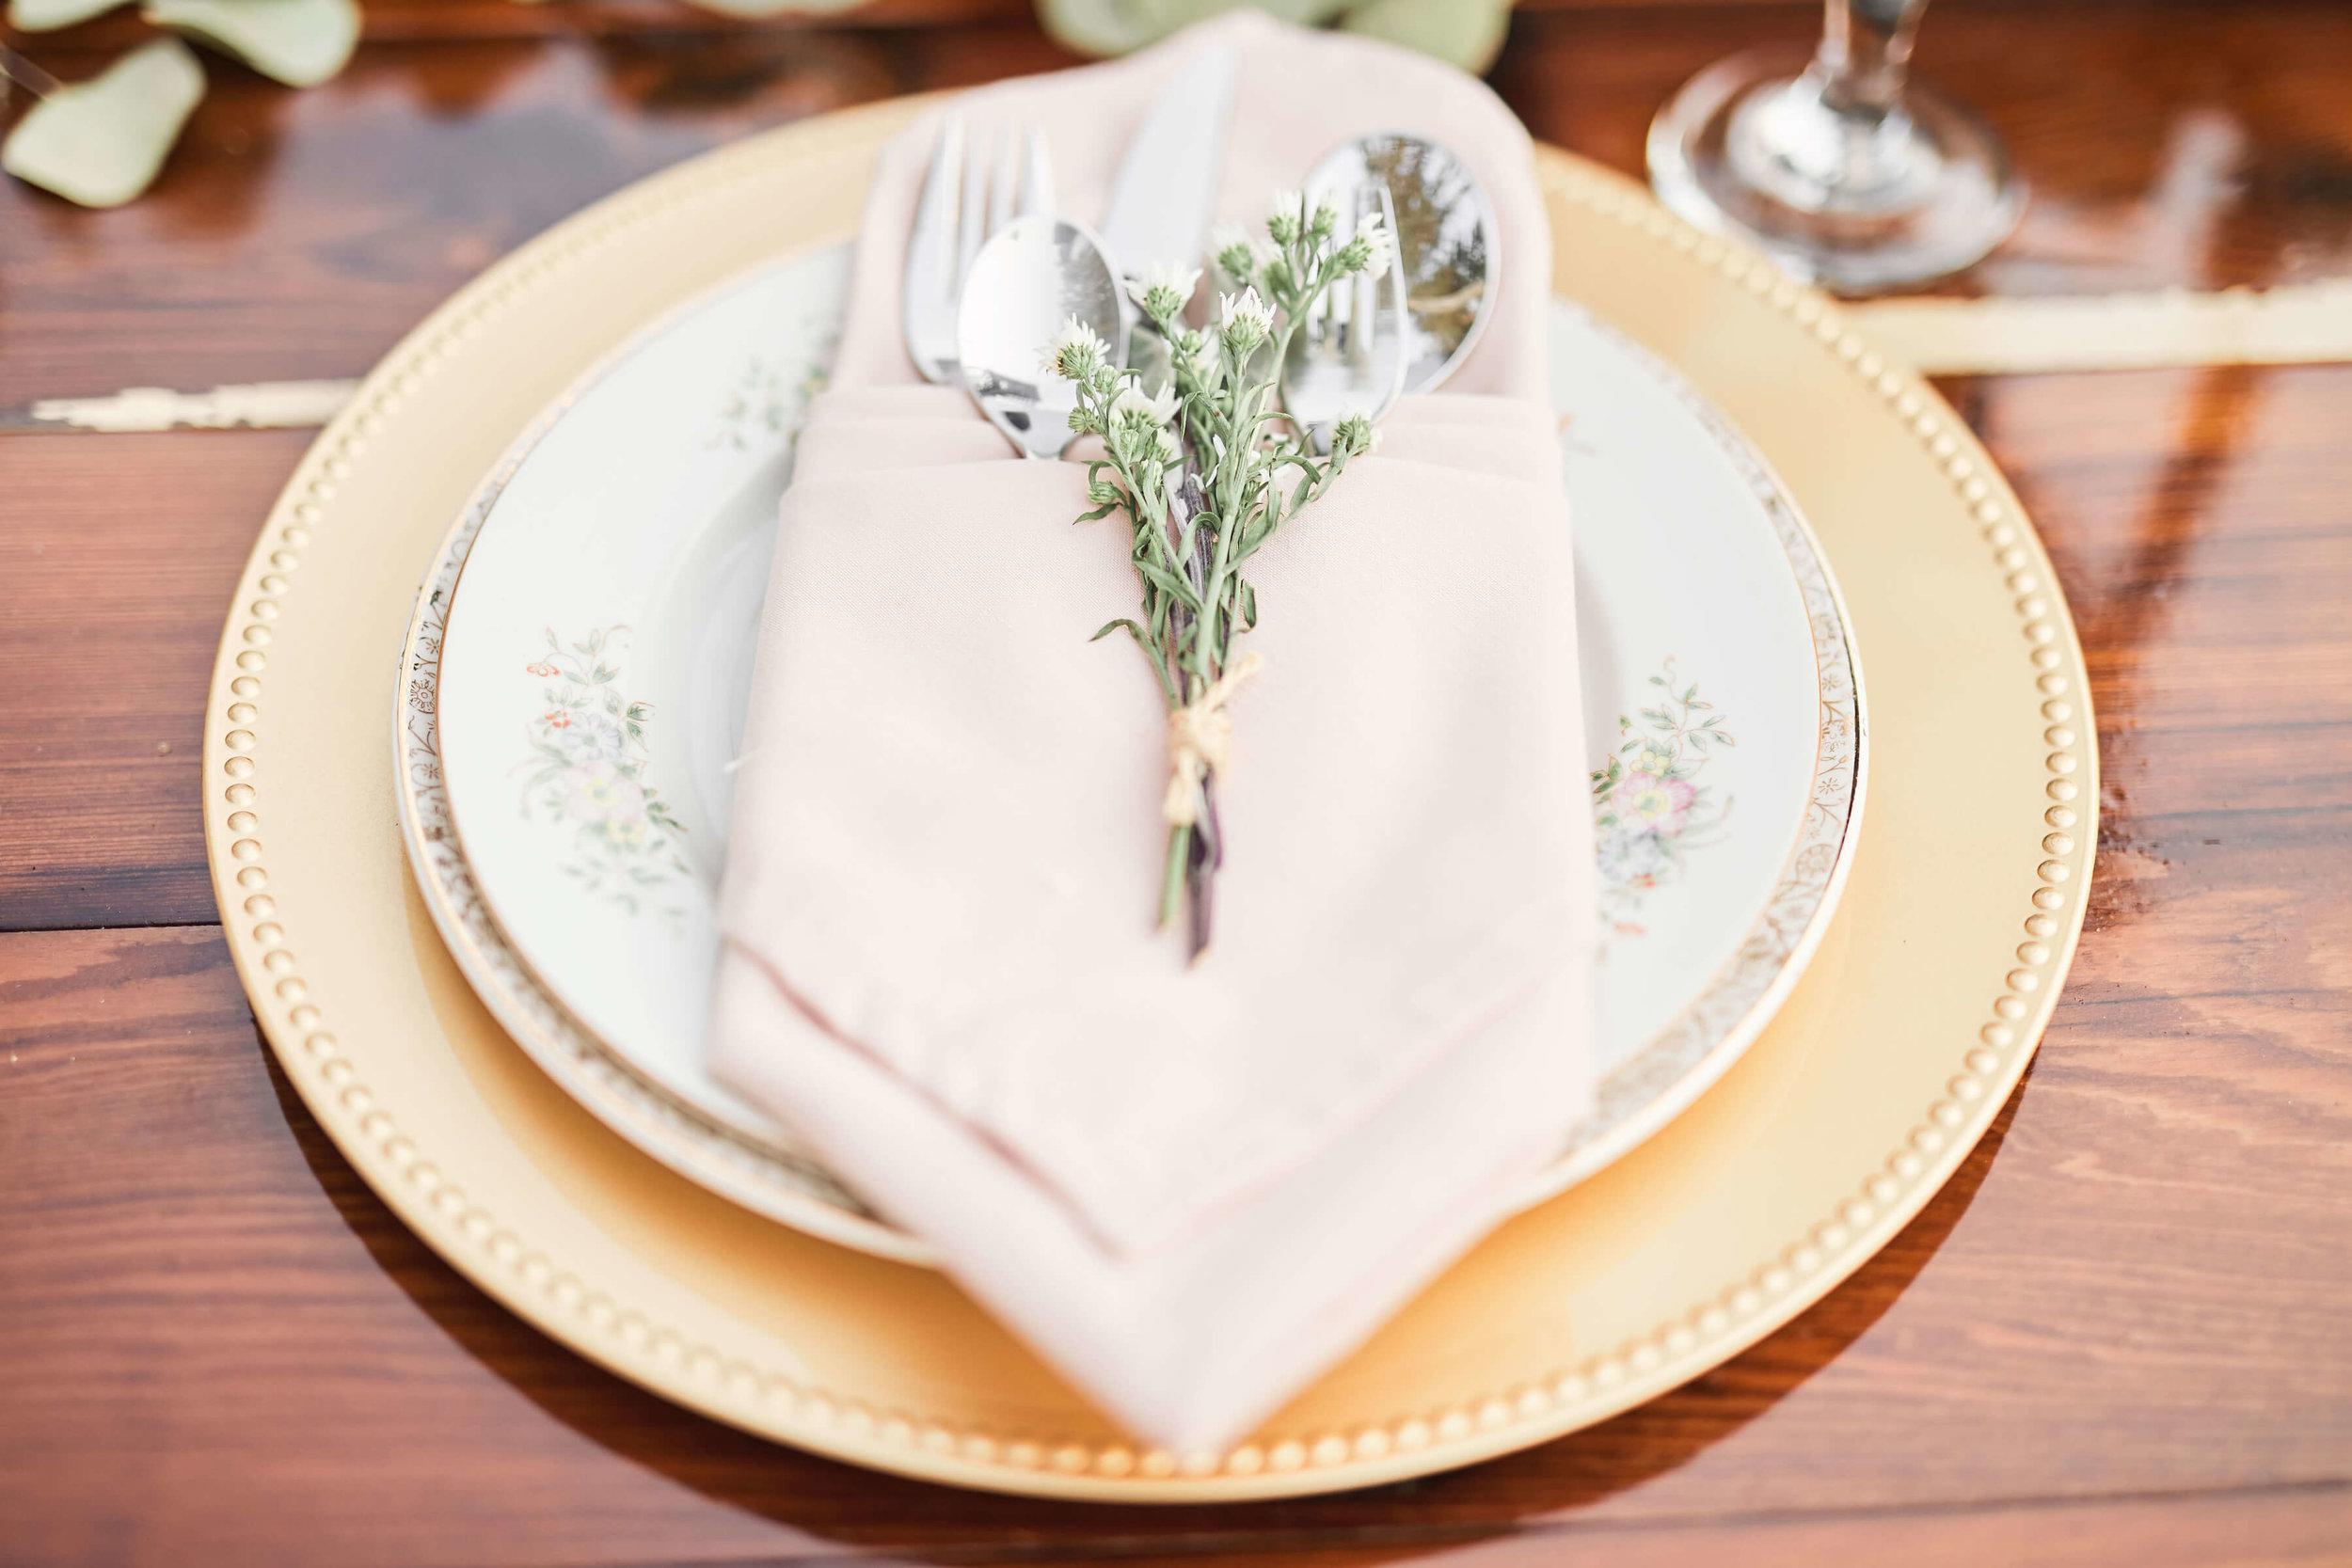 engle-olson-wedding-perry-james-photography-51.jpg